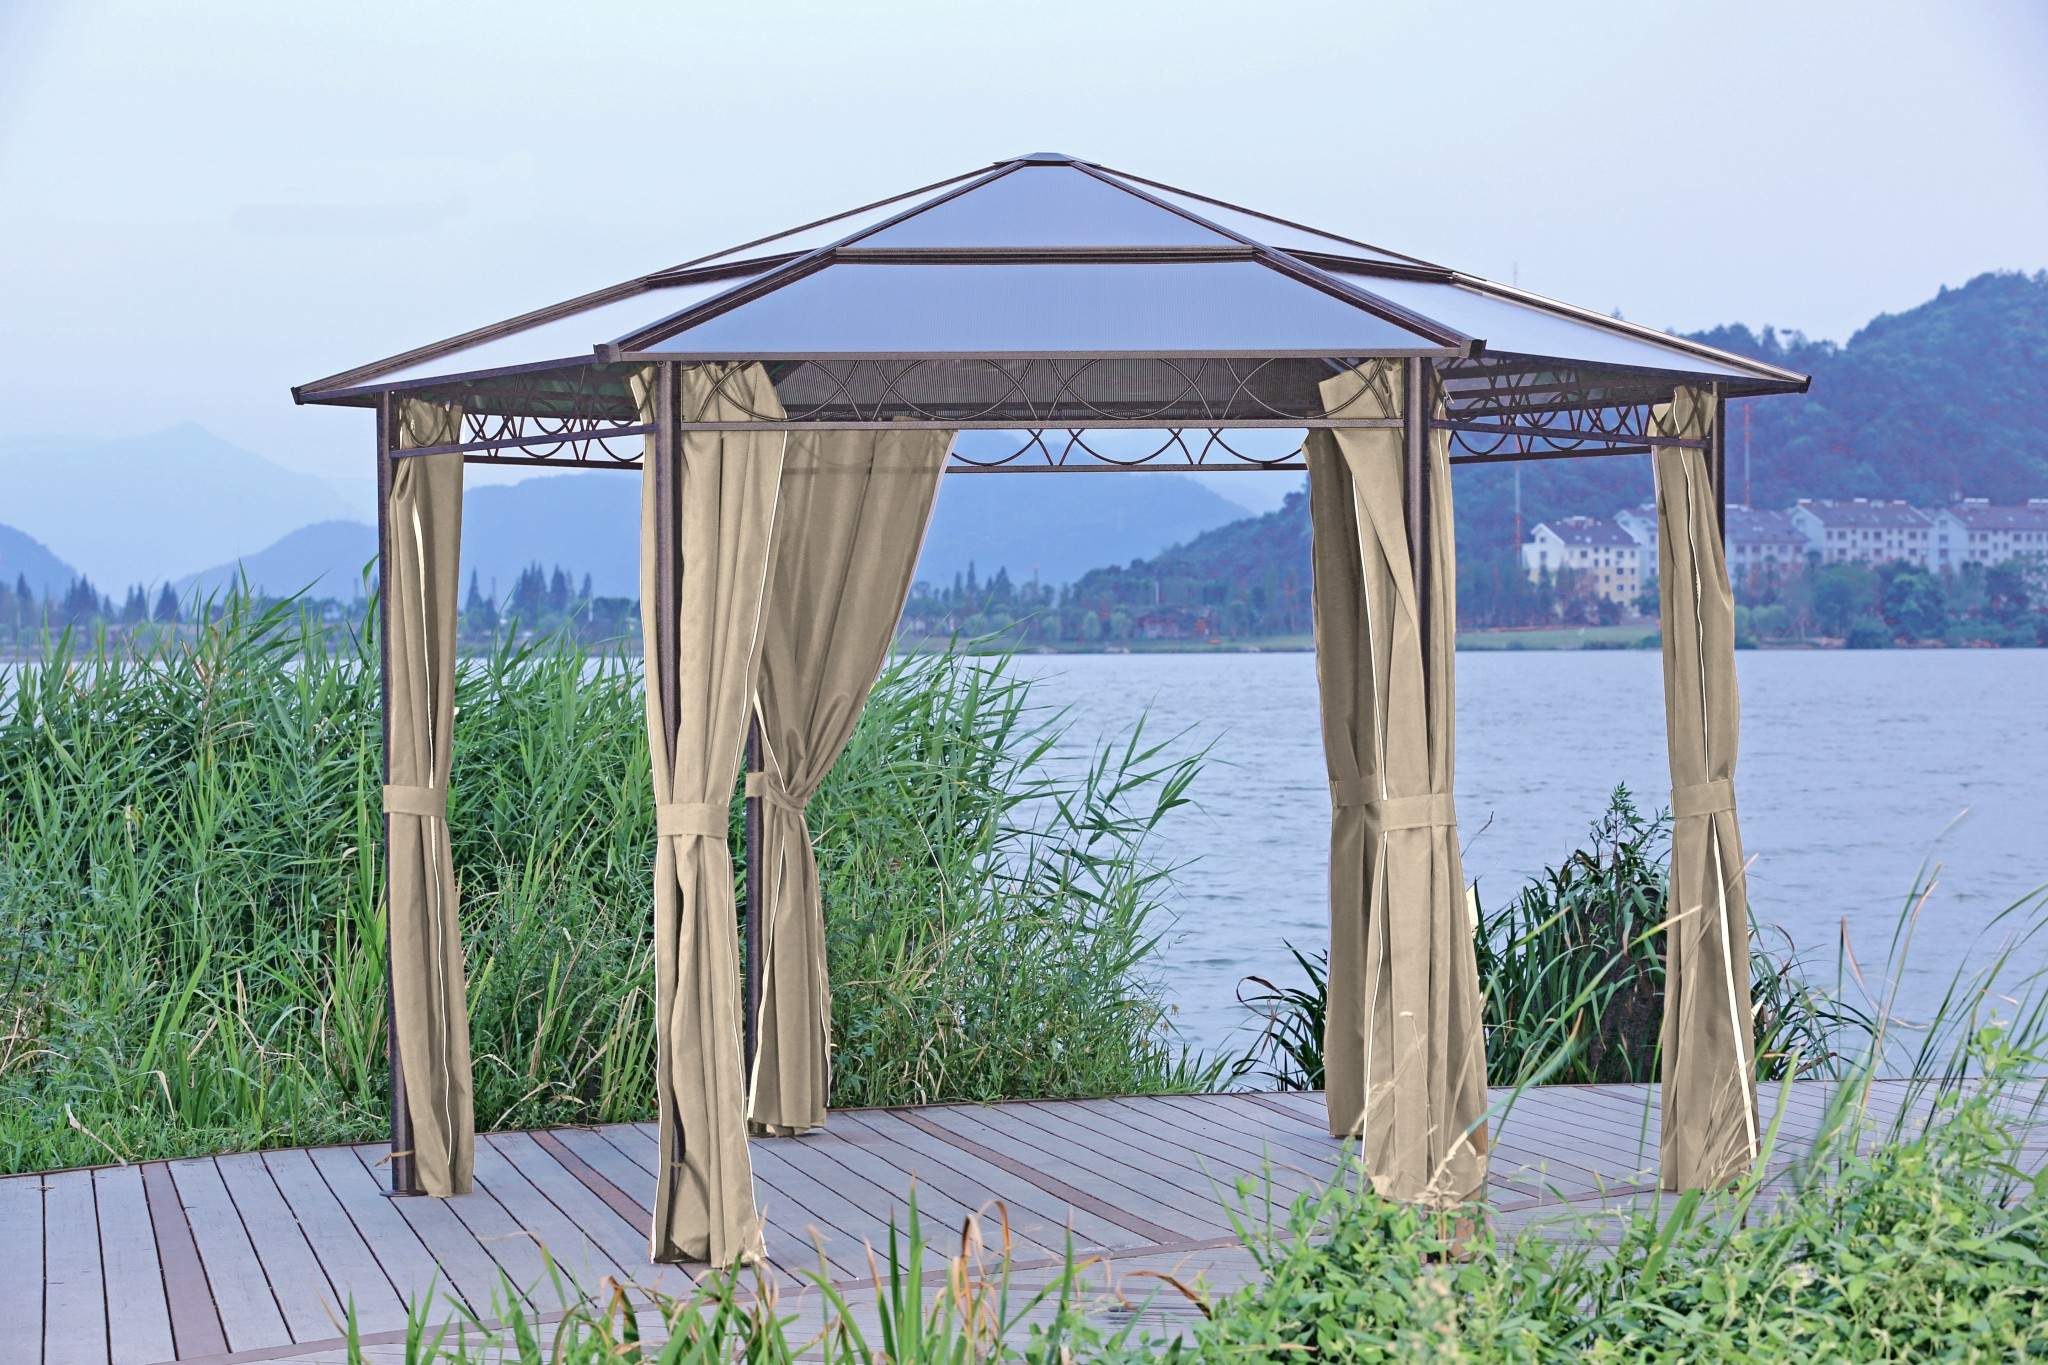 Pavillon Garten Elegant Details Zu Alu Pavillon 6 Eckig 2m Gartenzelt Partyzelt Garten Zelt Festzelt überdachung